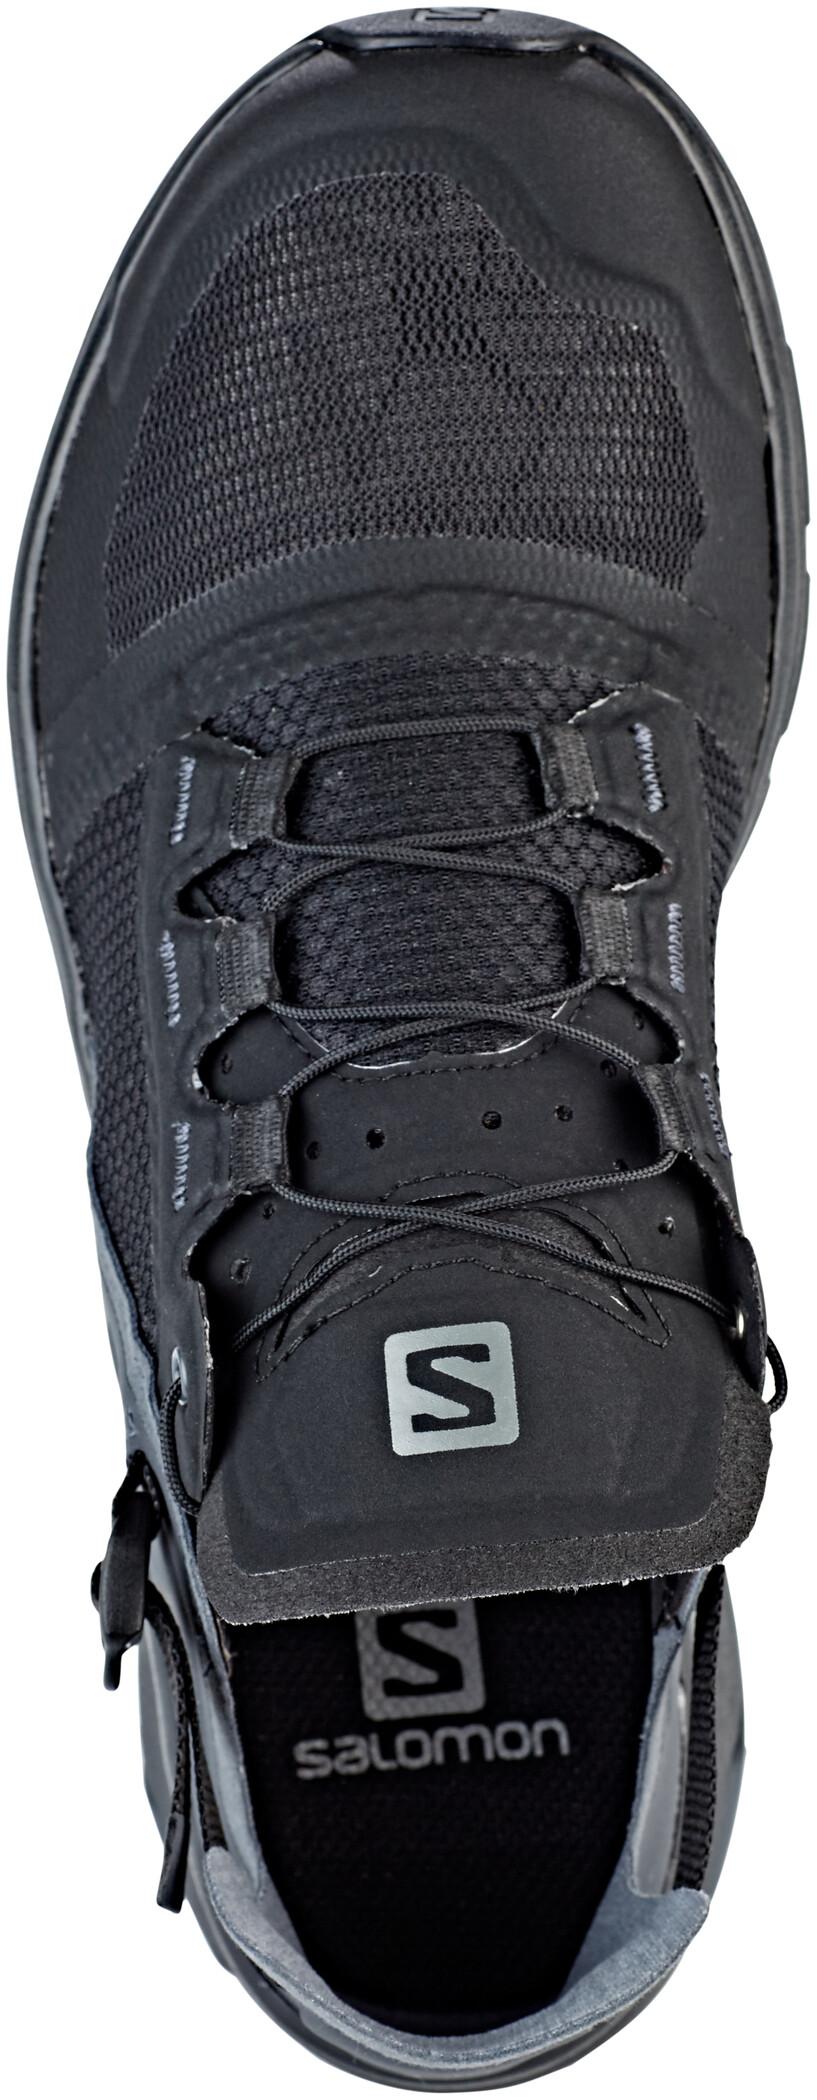 Salomon Techamphibian 4 Shoes Dam blackebonyquiet shade